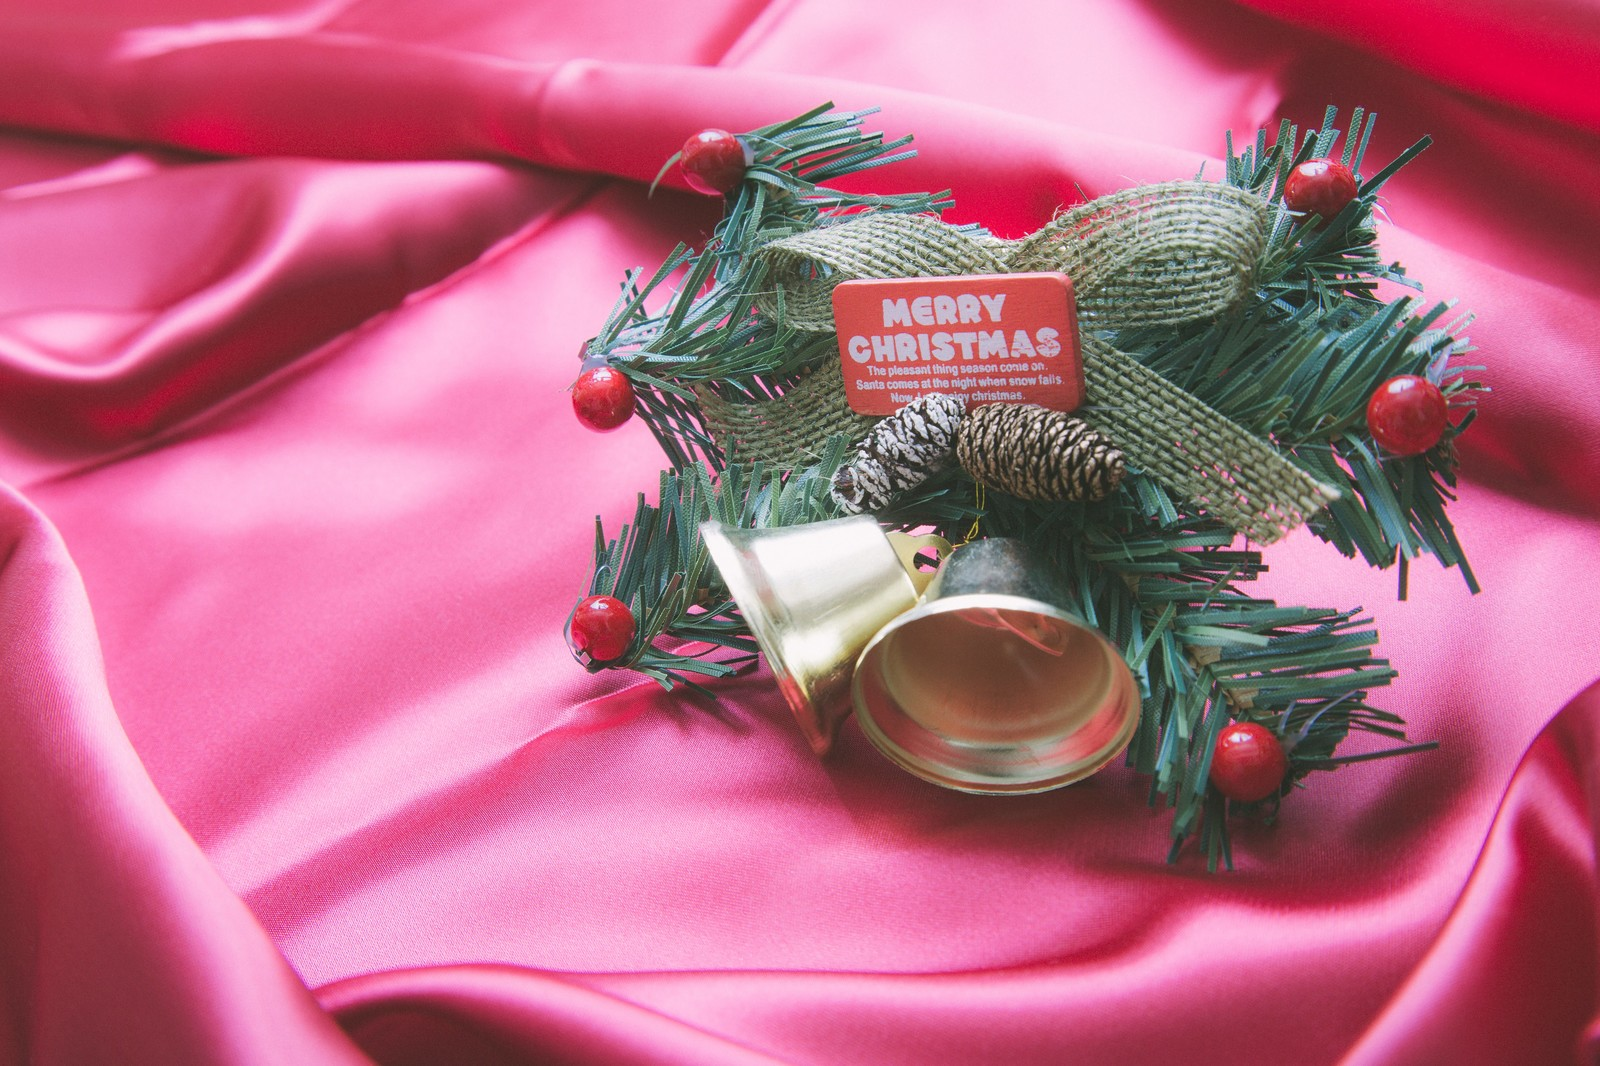 PAK85_Merrychristmas20141206154739_TP_V.jpg